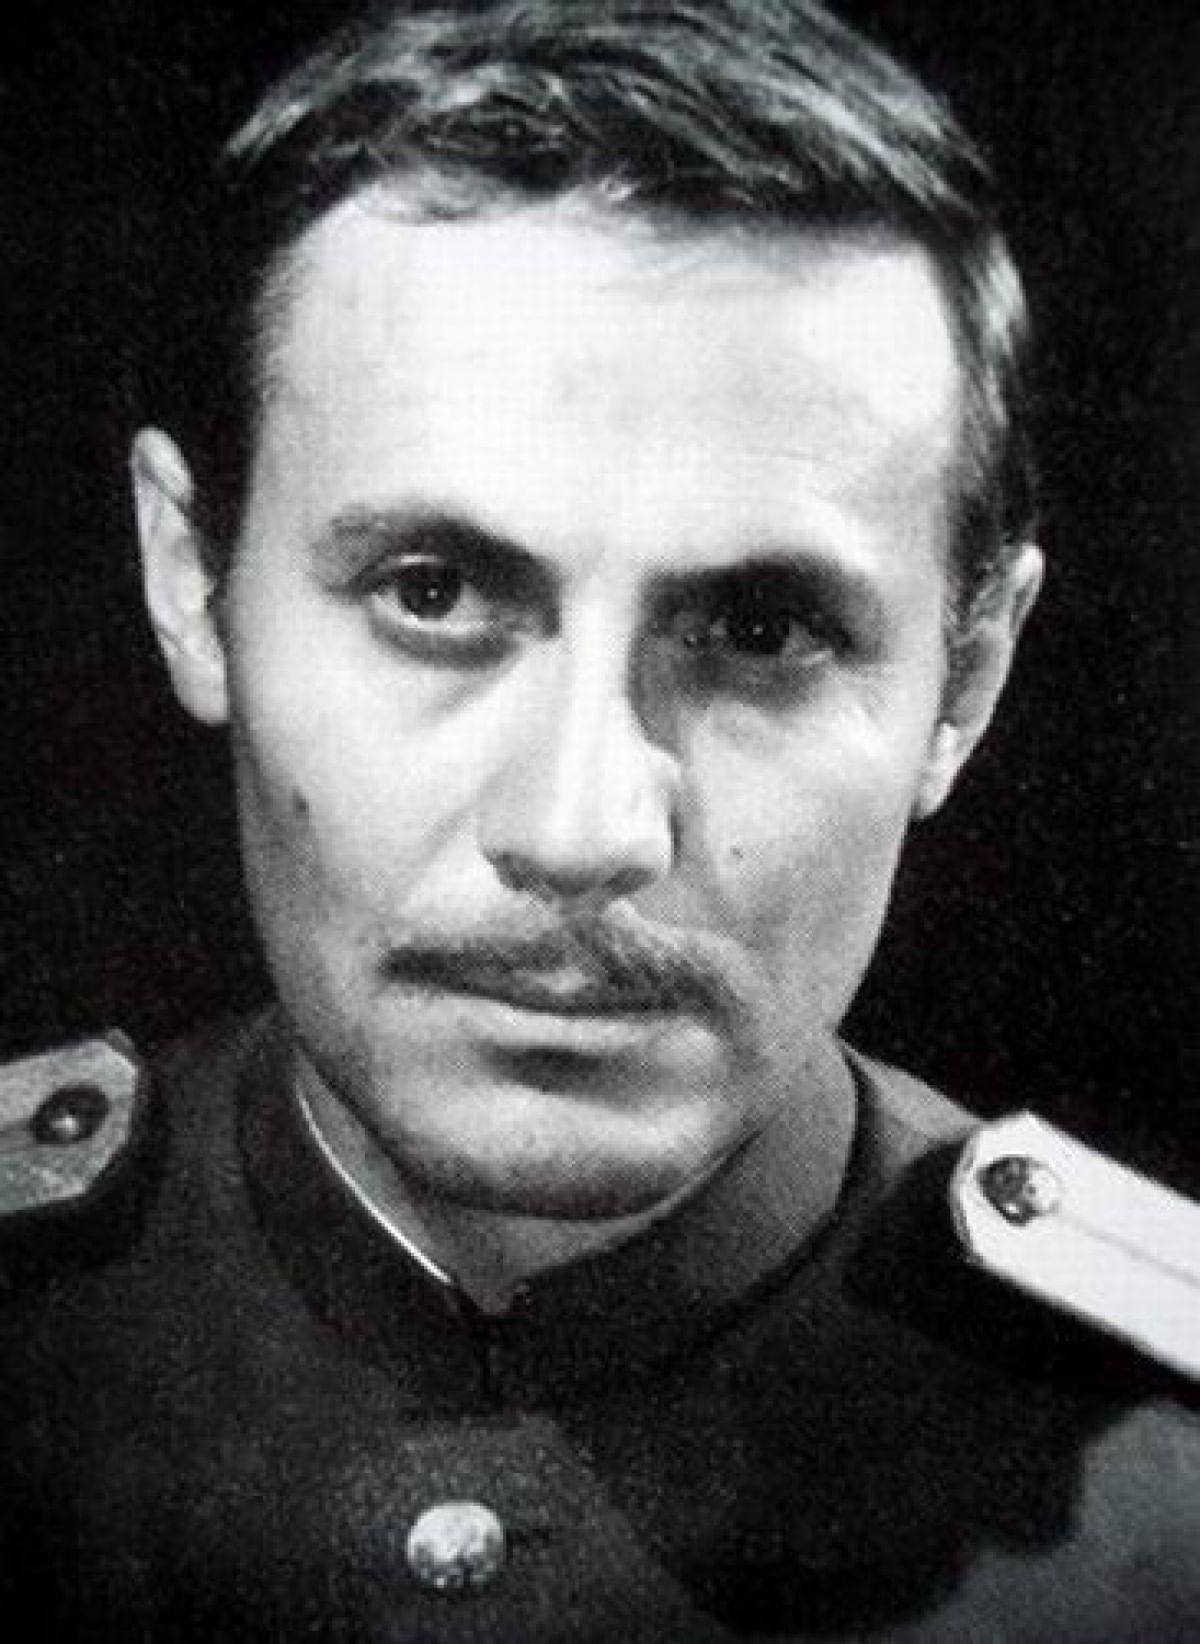 Галерея ролей Юрия Соломина